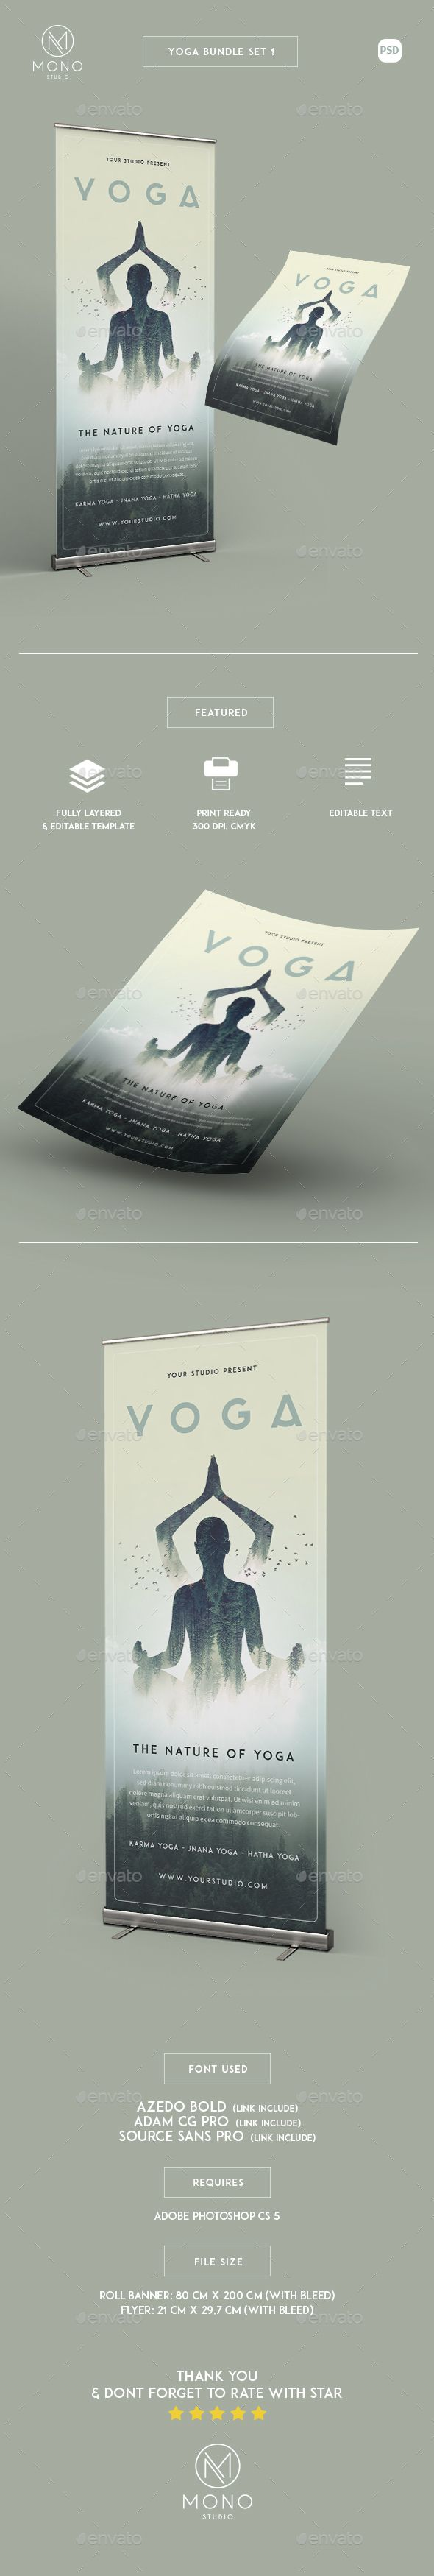 Yoga Bundle Set 1 / Flyer - Roll Banner  — PSD Template